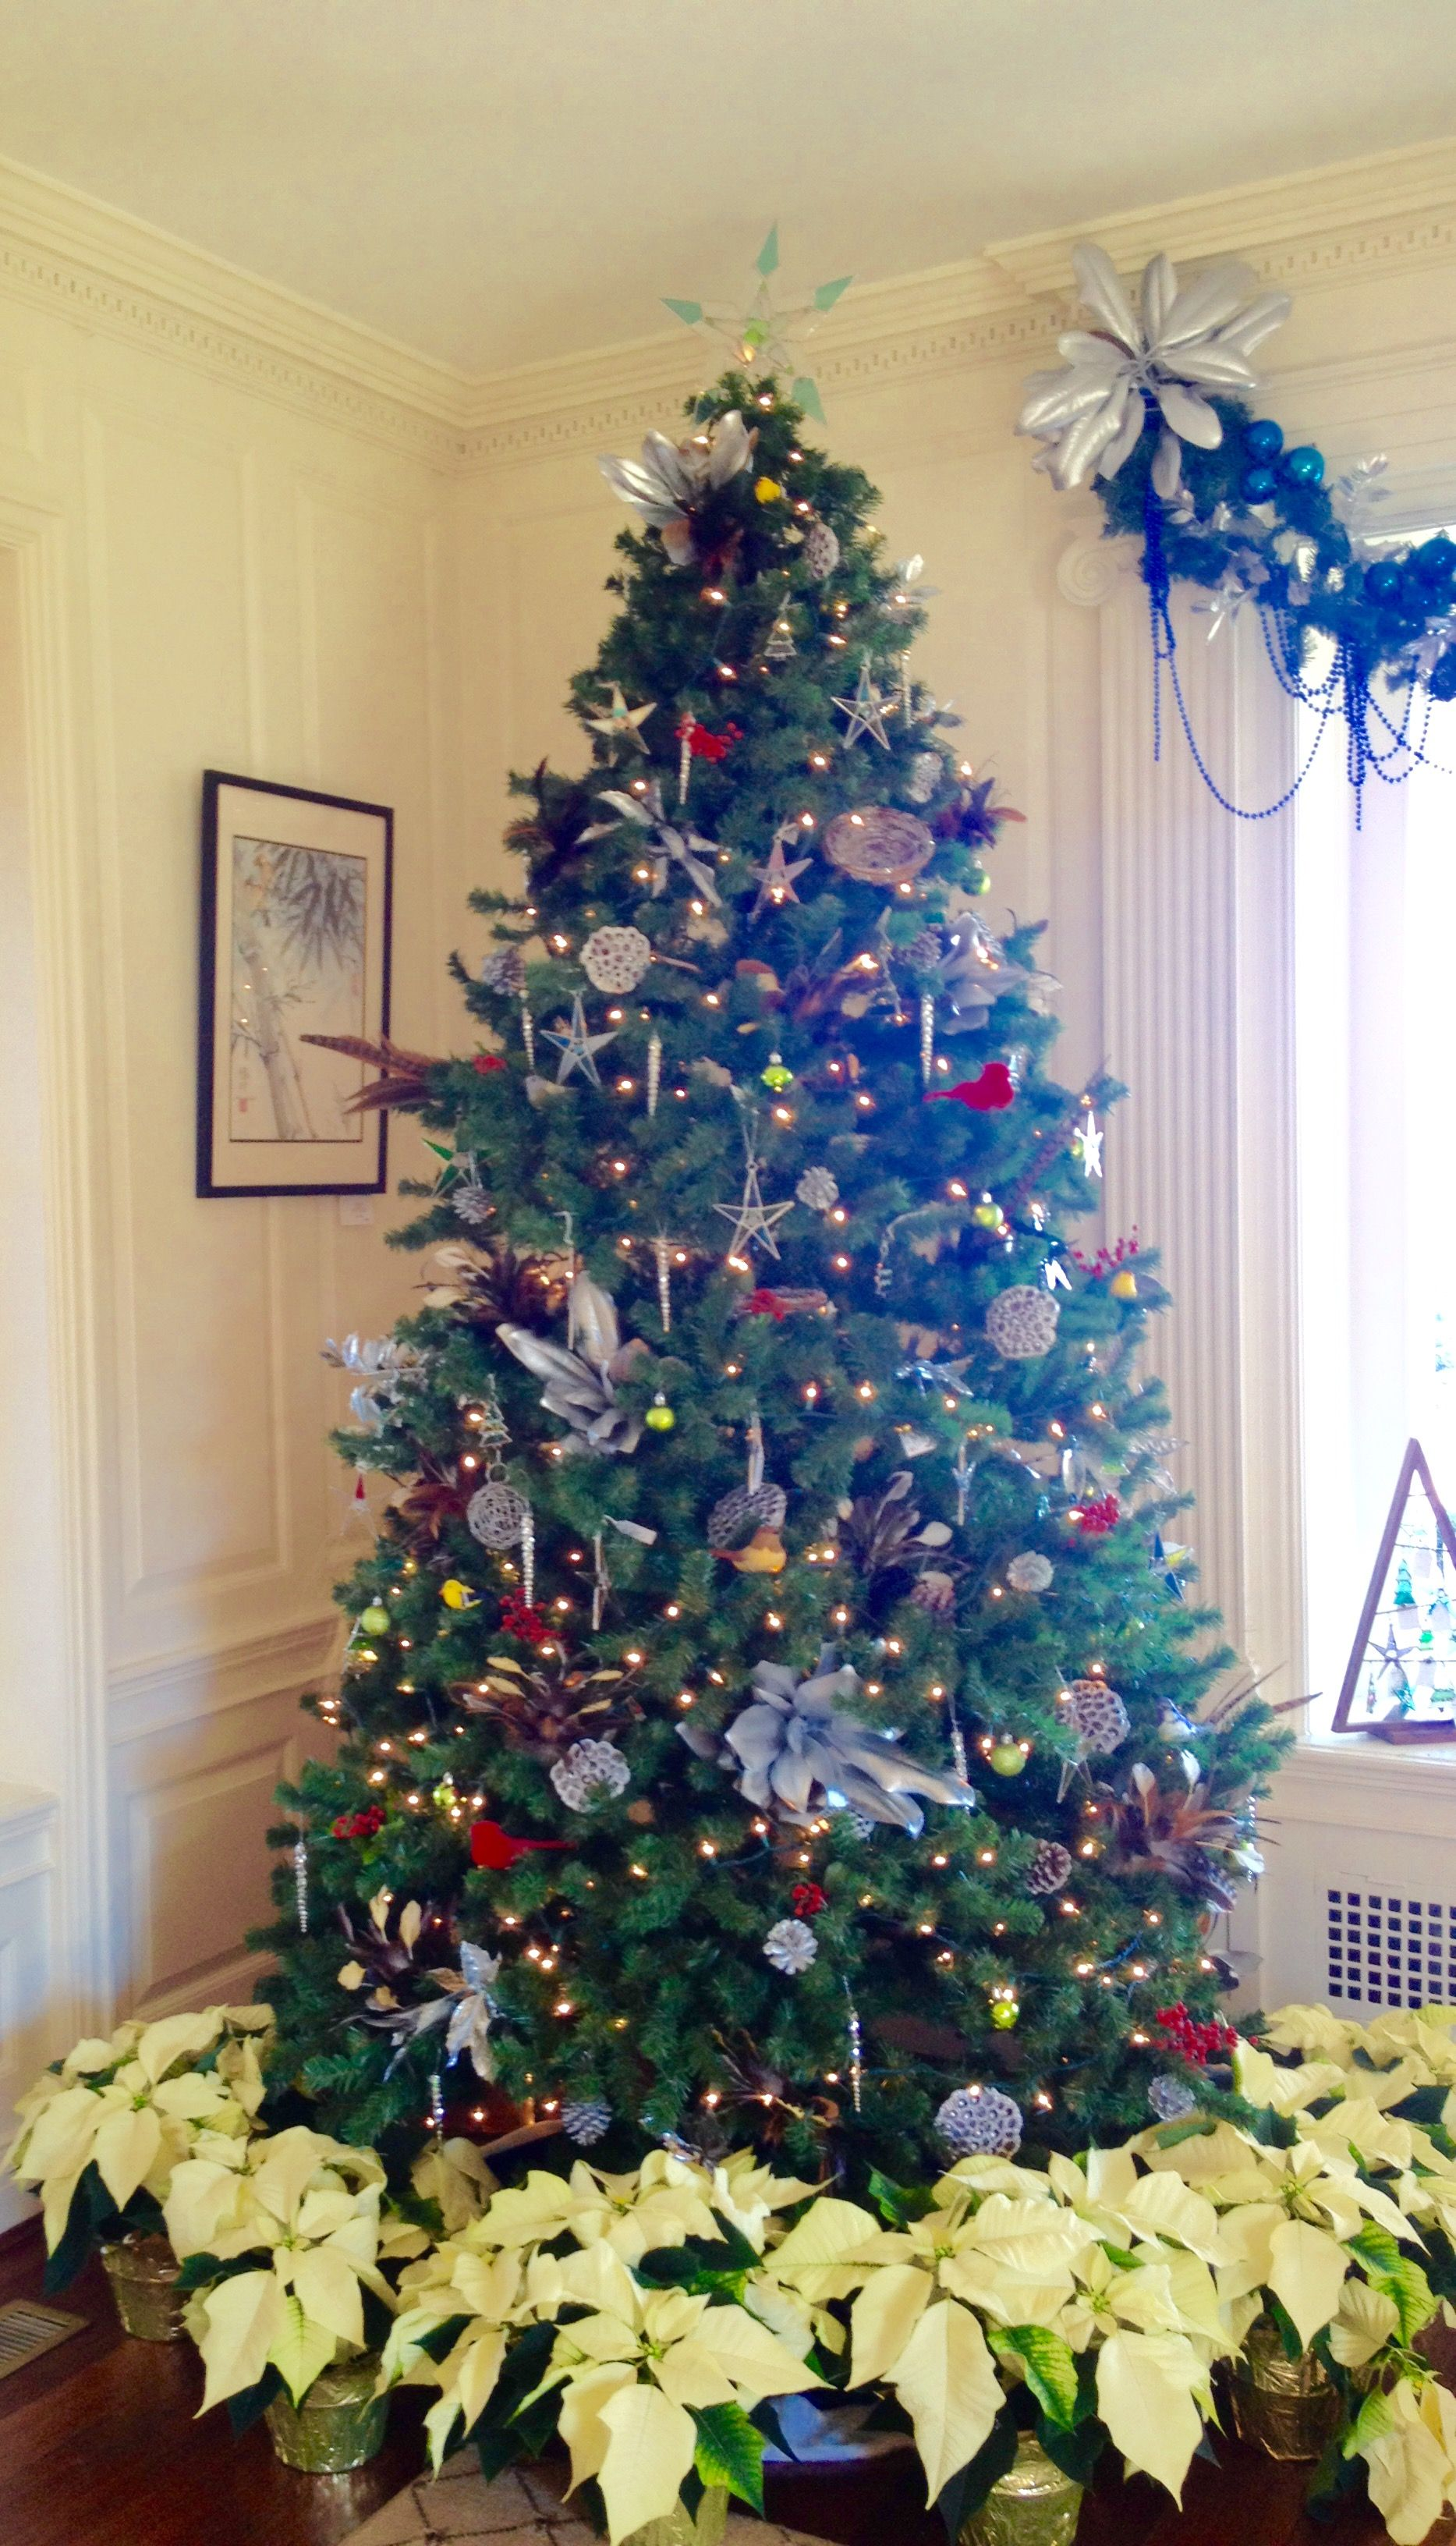 2015 Tree with poinsettias